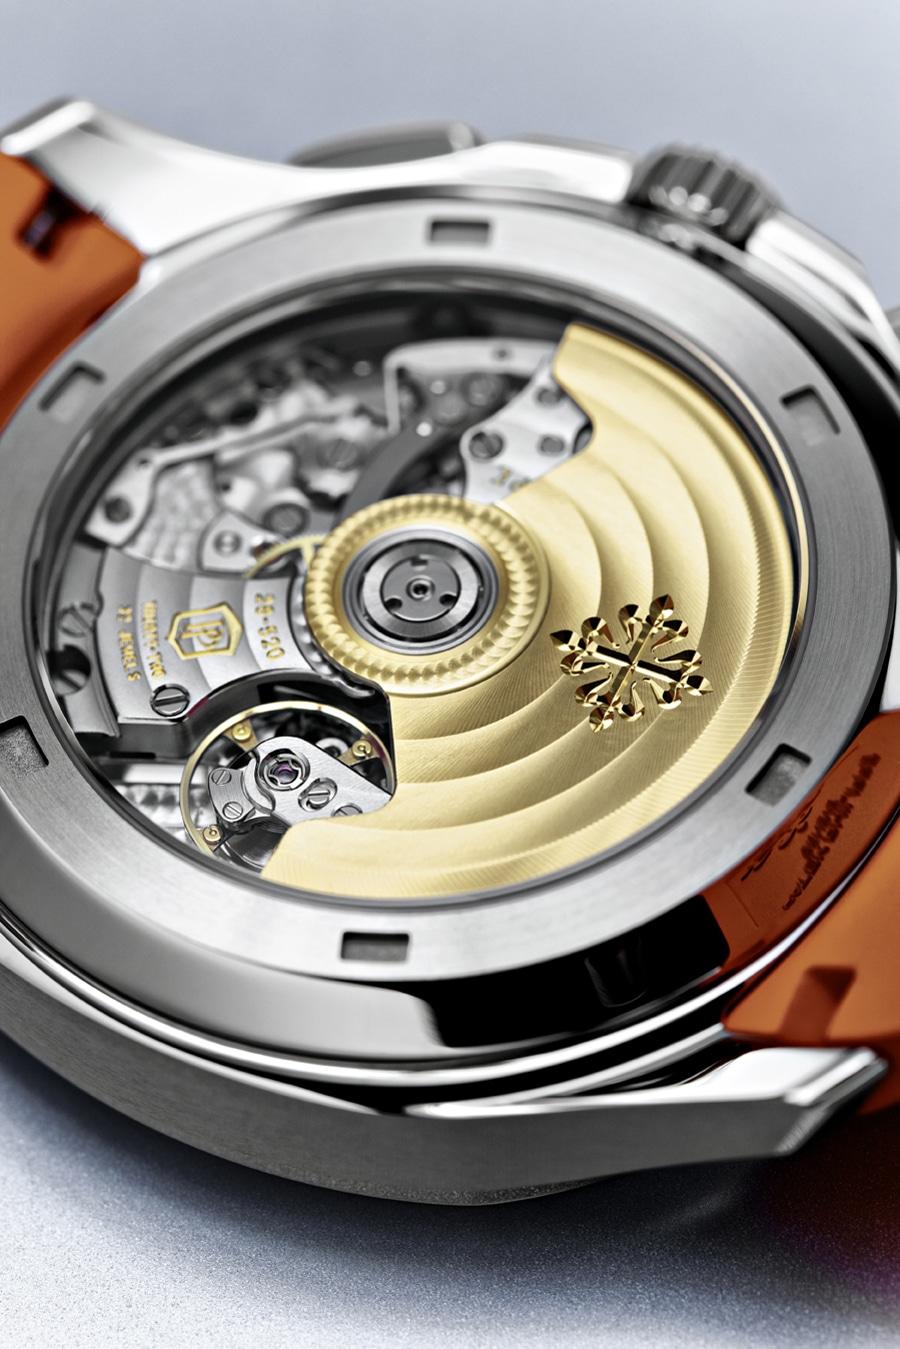 Patek Philippe Aquanaut Chronograph Manufakturkaliber CH 28-520 C